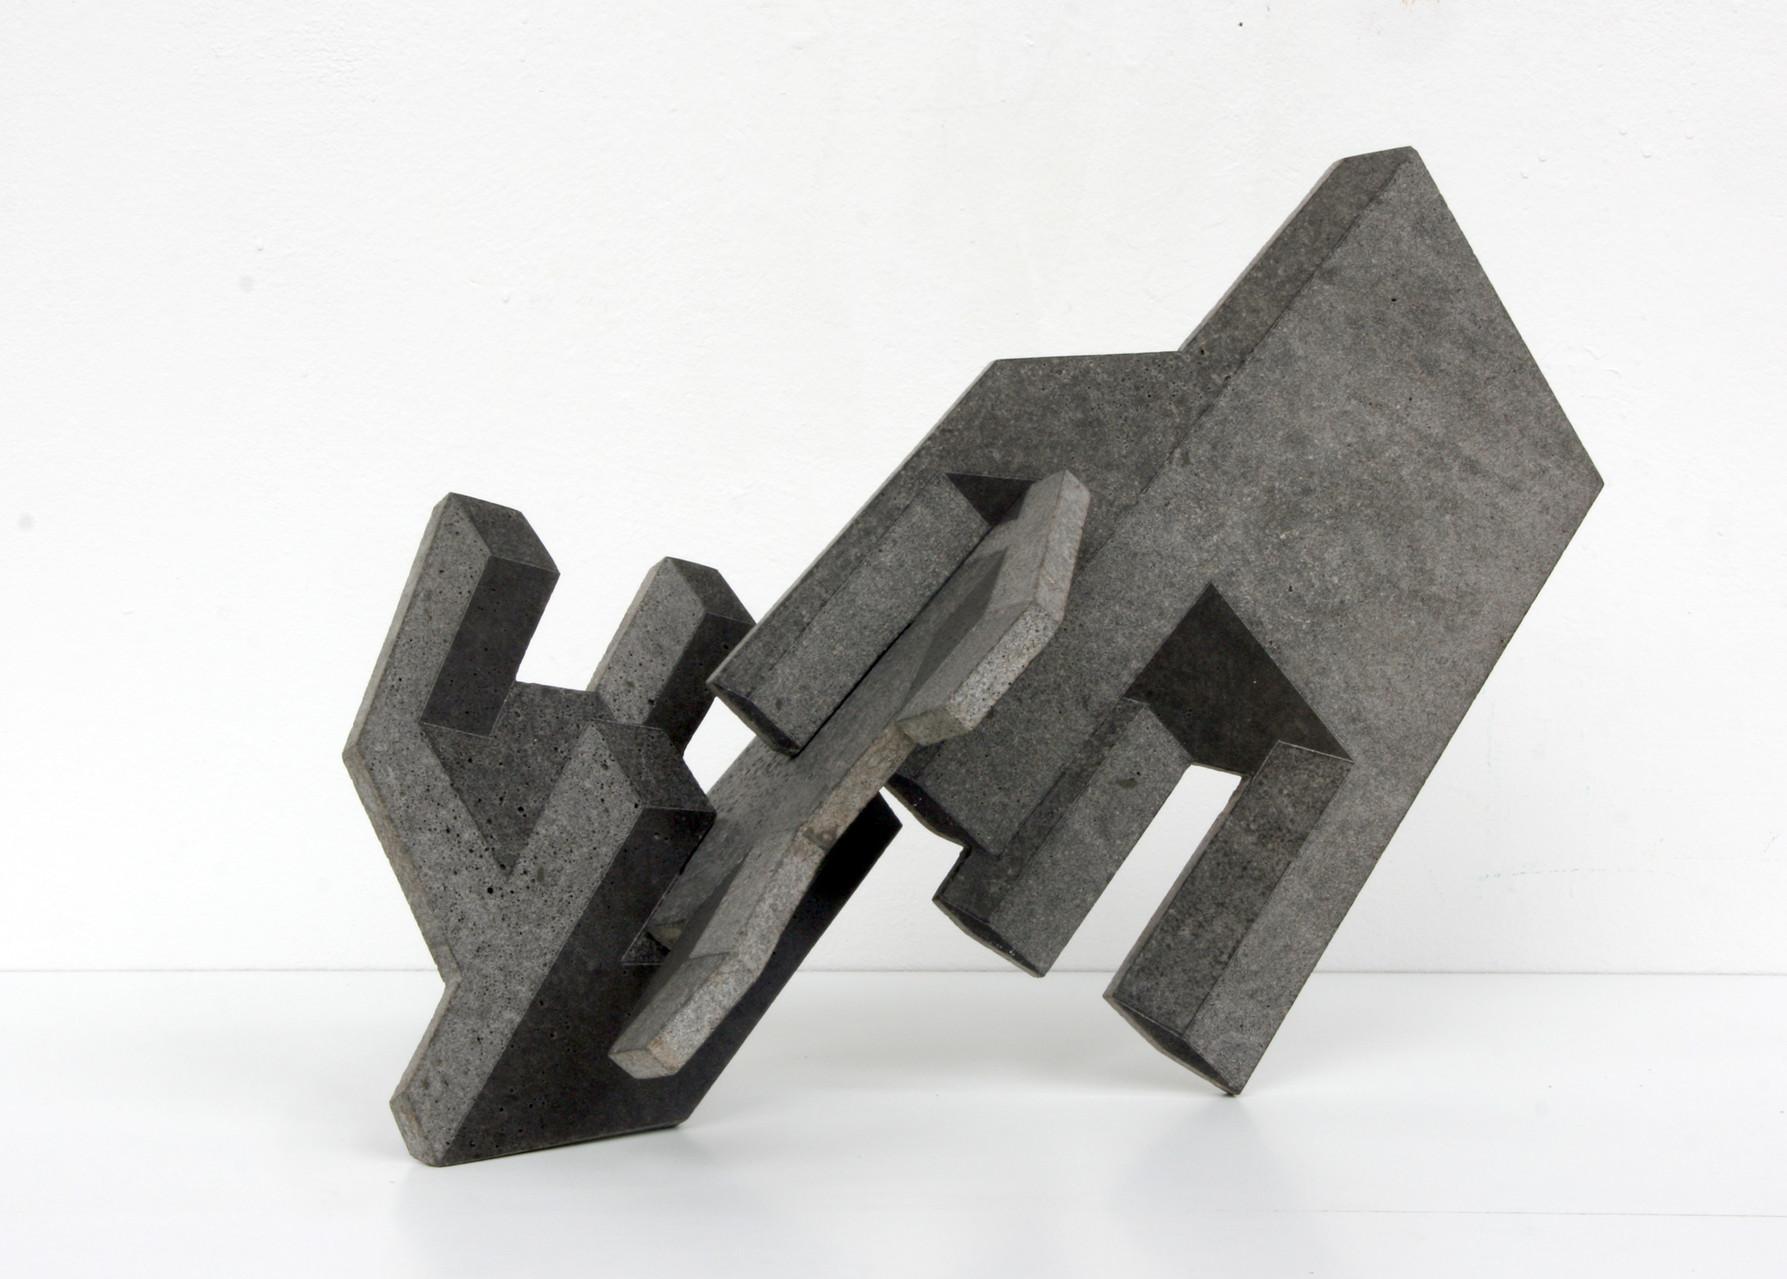 """Drei Stühle"" Beton / Gravur, 30 x 30 x 30, 2010"